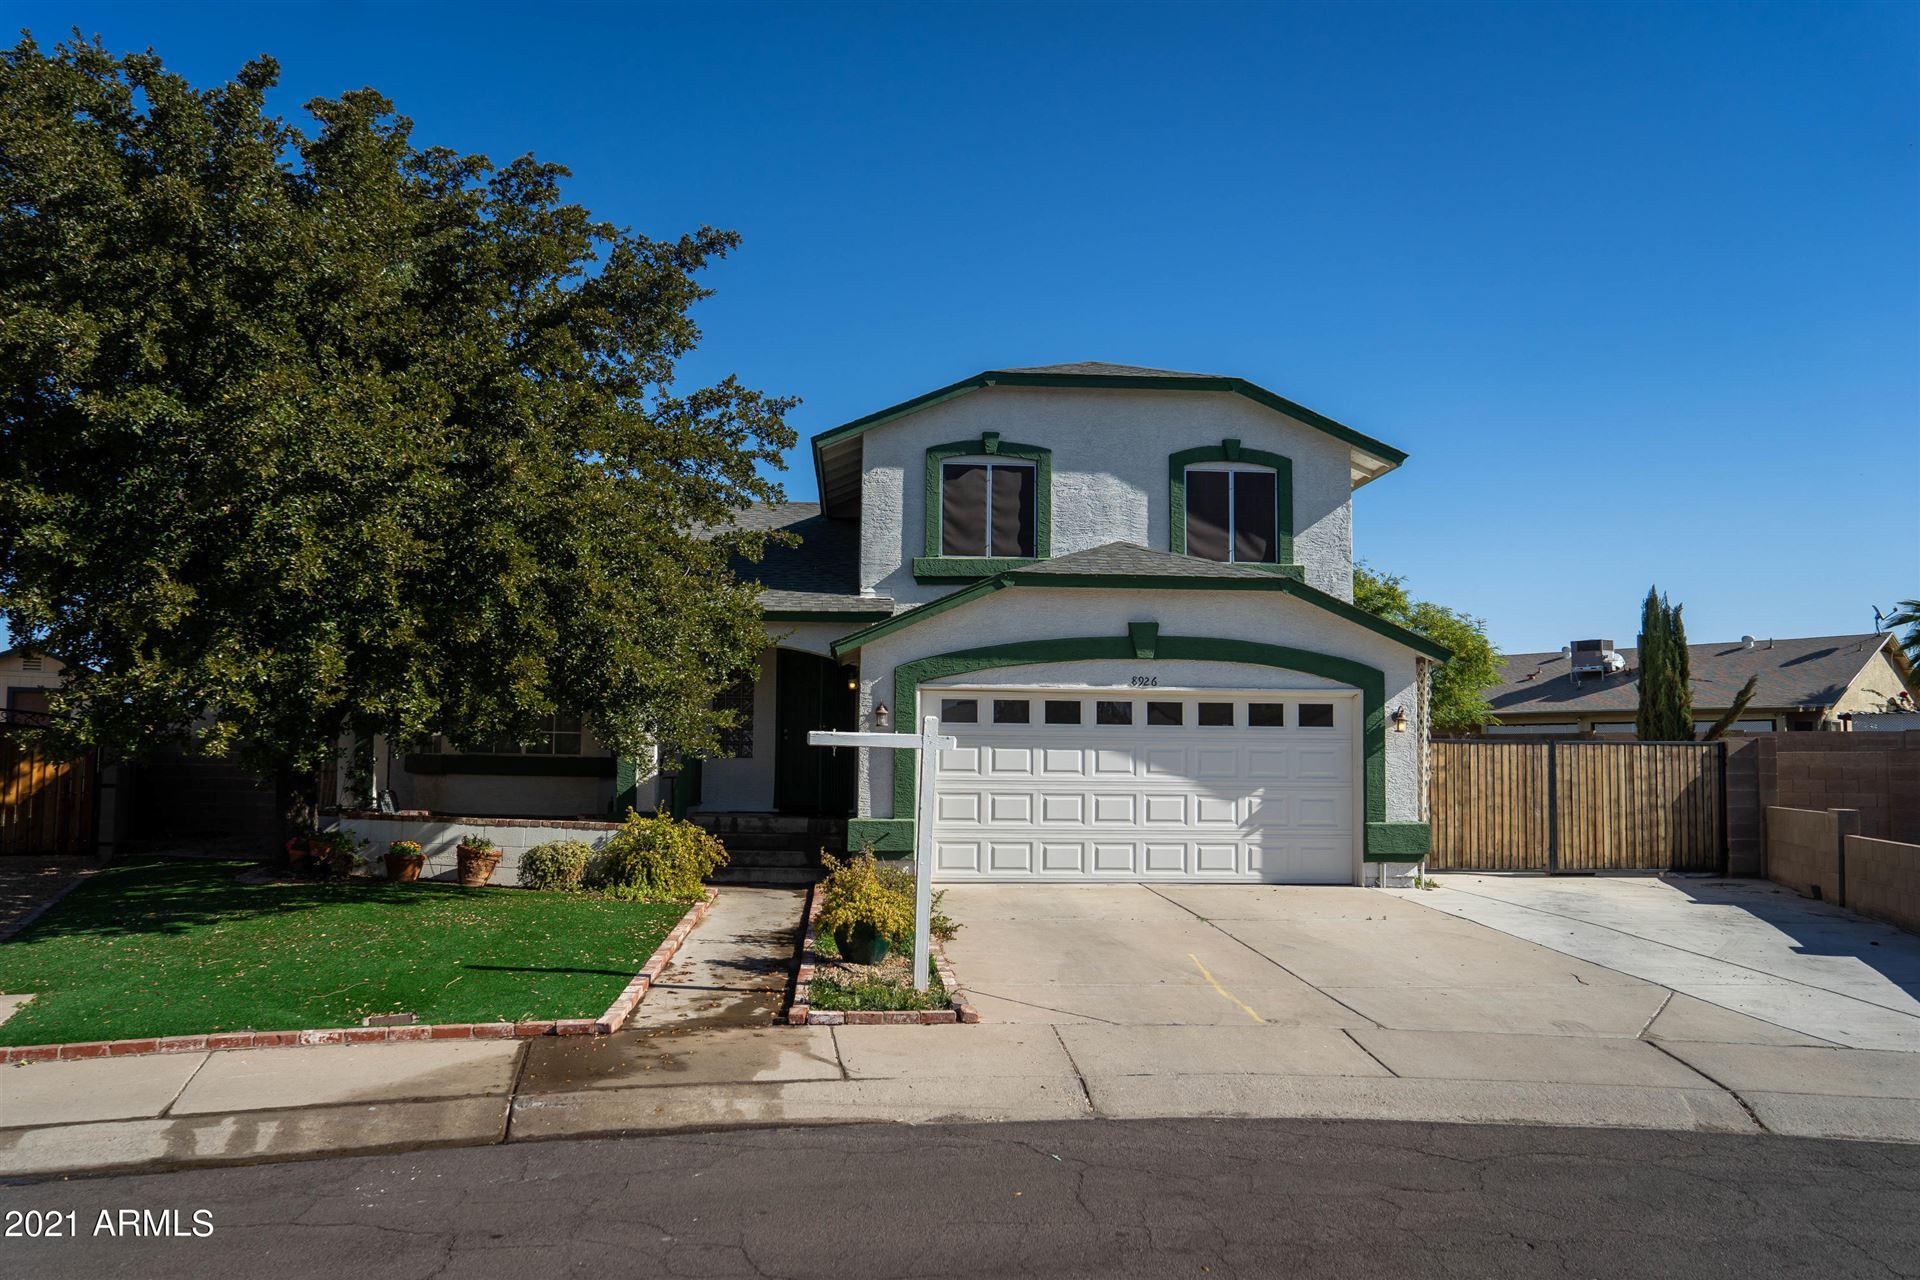 Photo of 8926 W OCOTILLO Road, Glendale, AZ 85305 (MLS # 6200295)